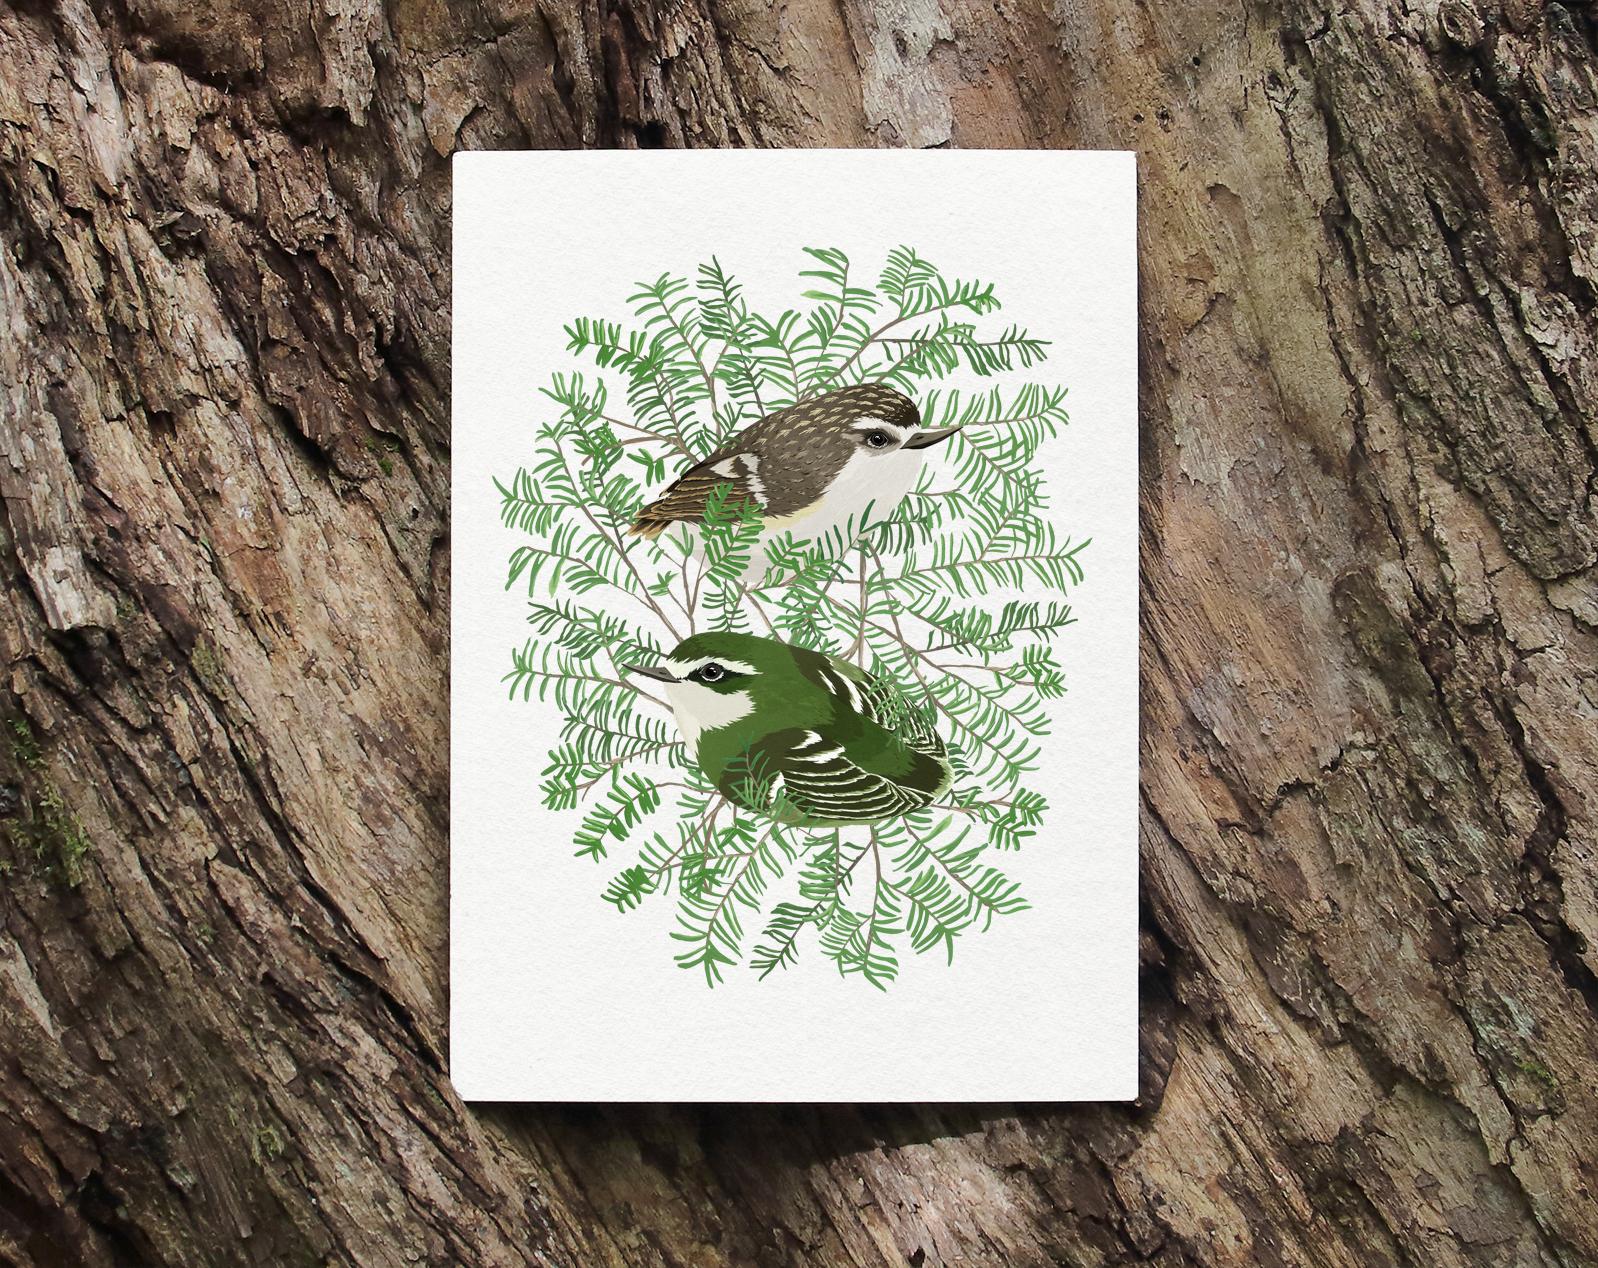 rifleman print on wood.jpg